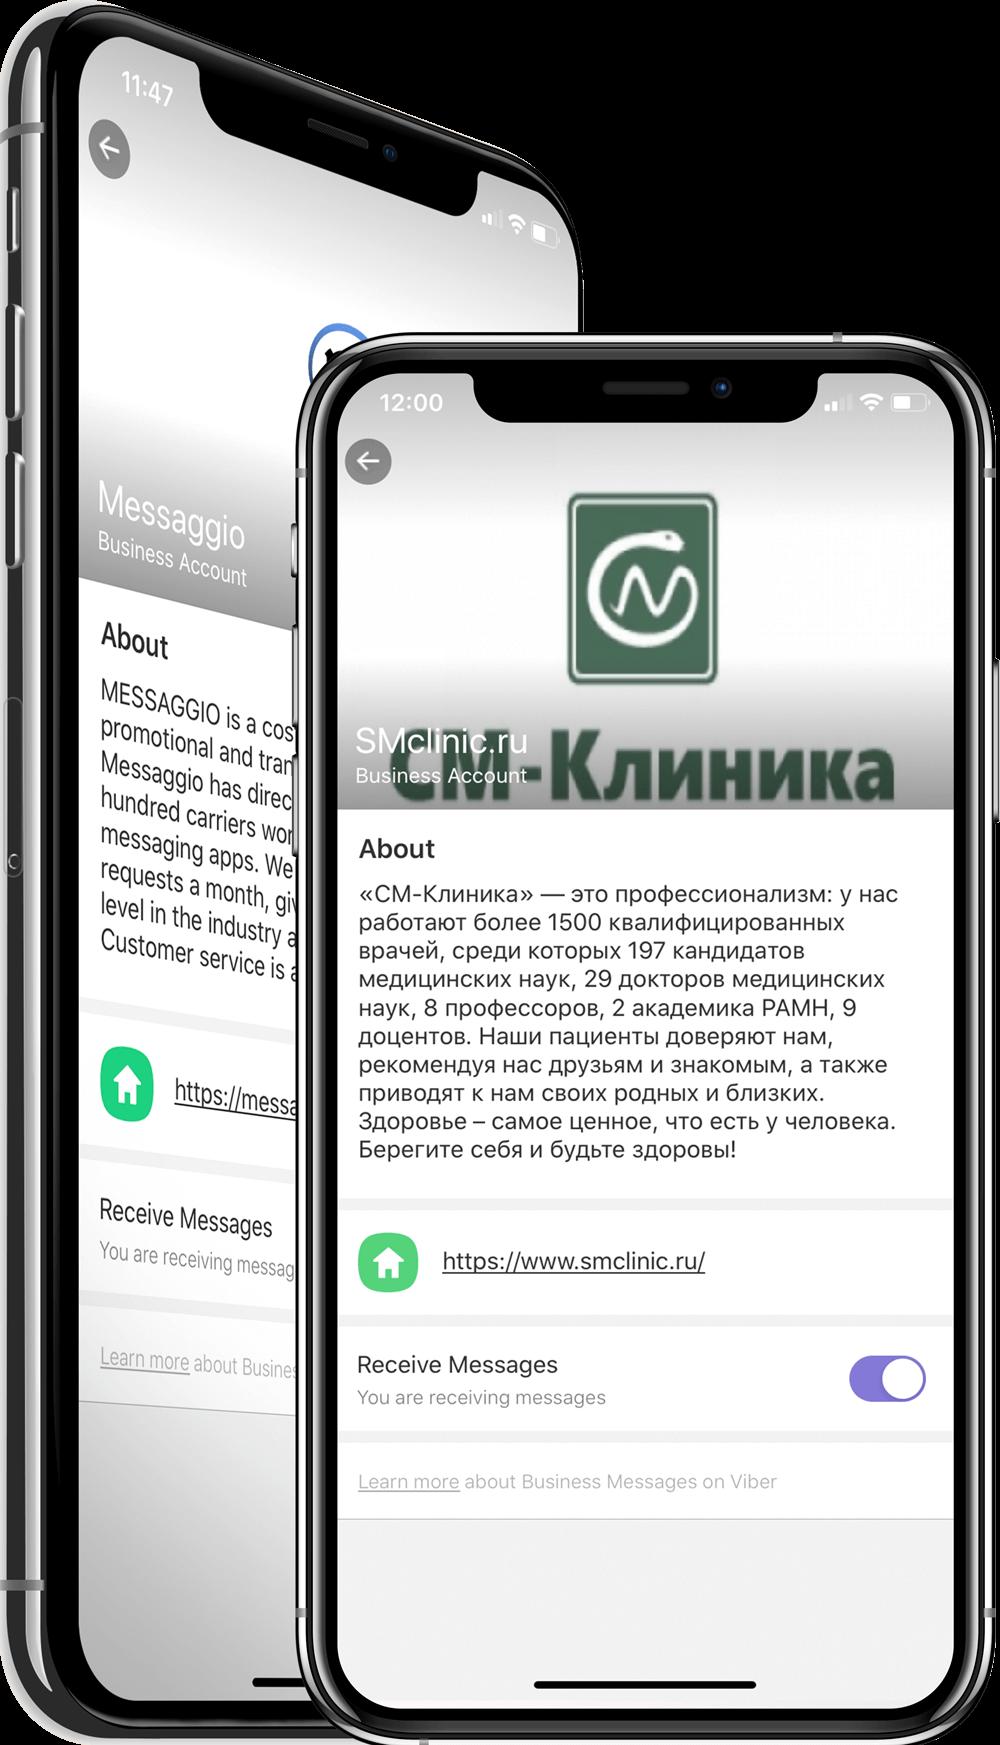 Messaggio.com Multichannel messaging platform. Viber, WhatsApp, SMS & RCS business messaging.